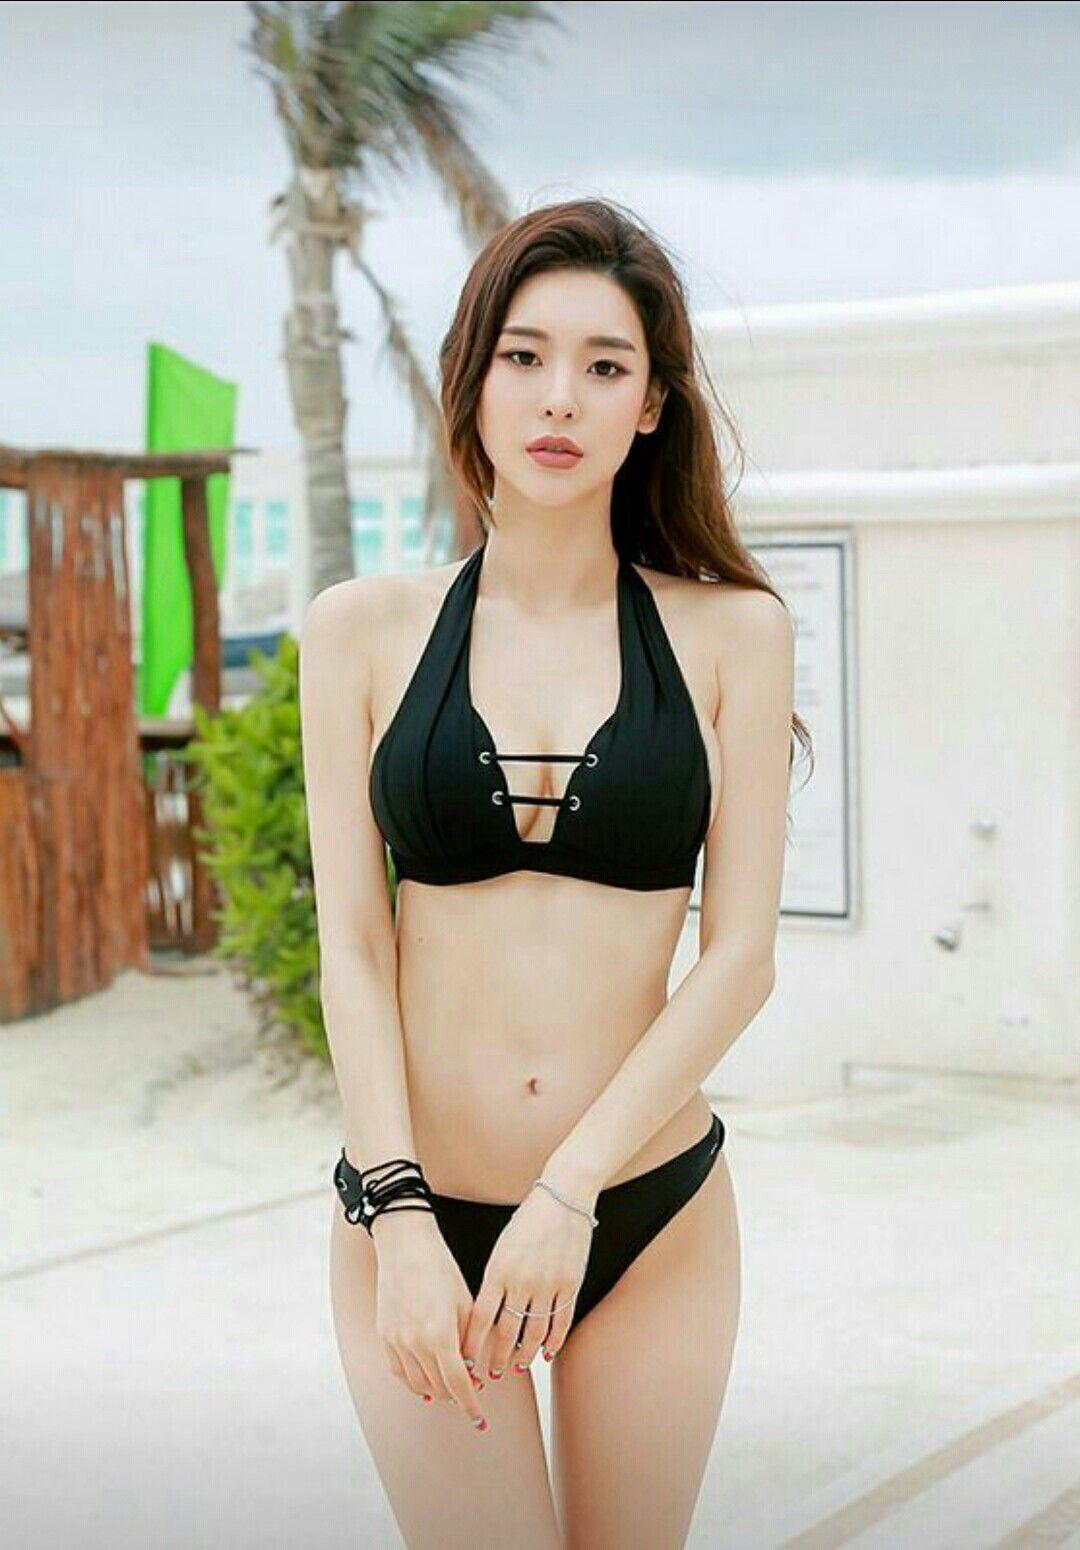 Chubby chica porn clip